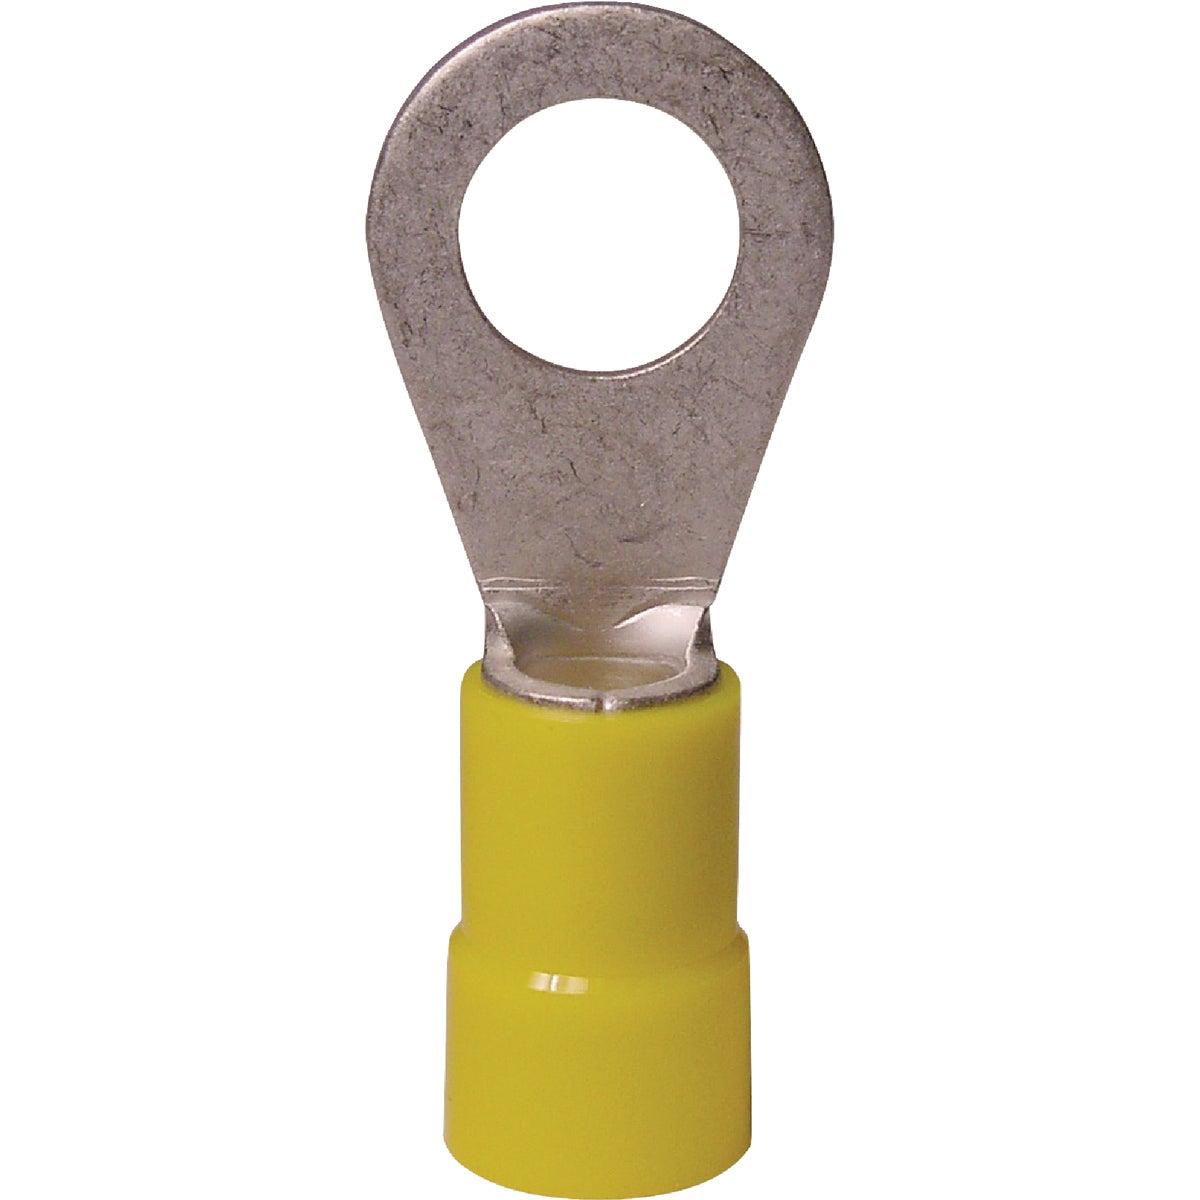 12-10 RING TERMINAL - 10-106 by G B Electrical Inc